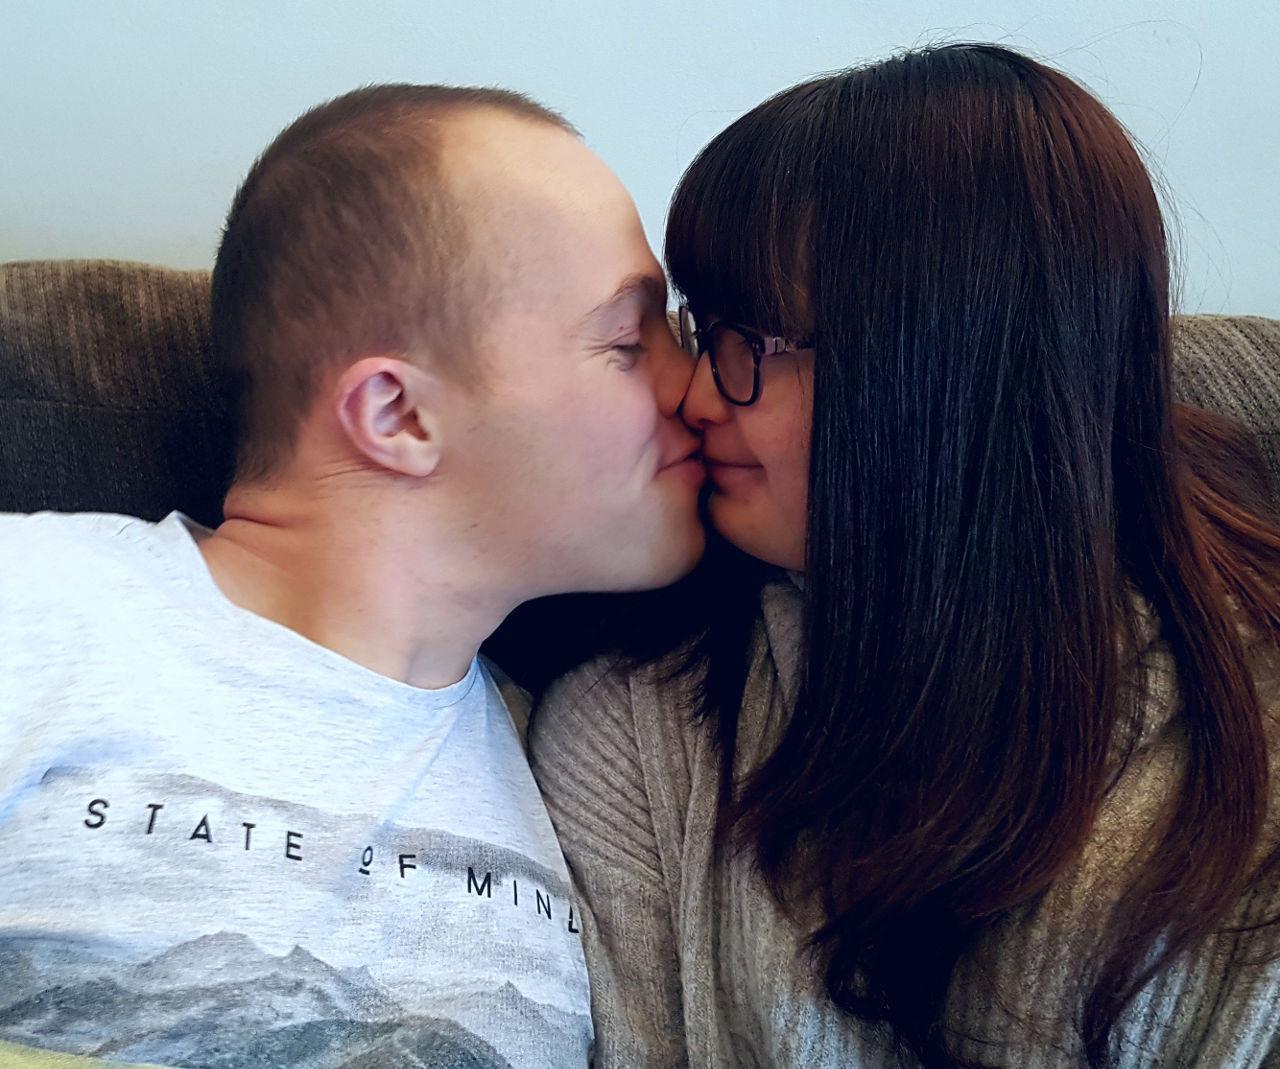 Sam and Megan kiss.